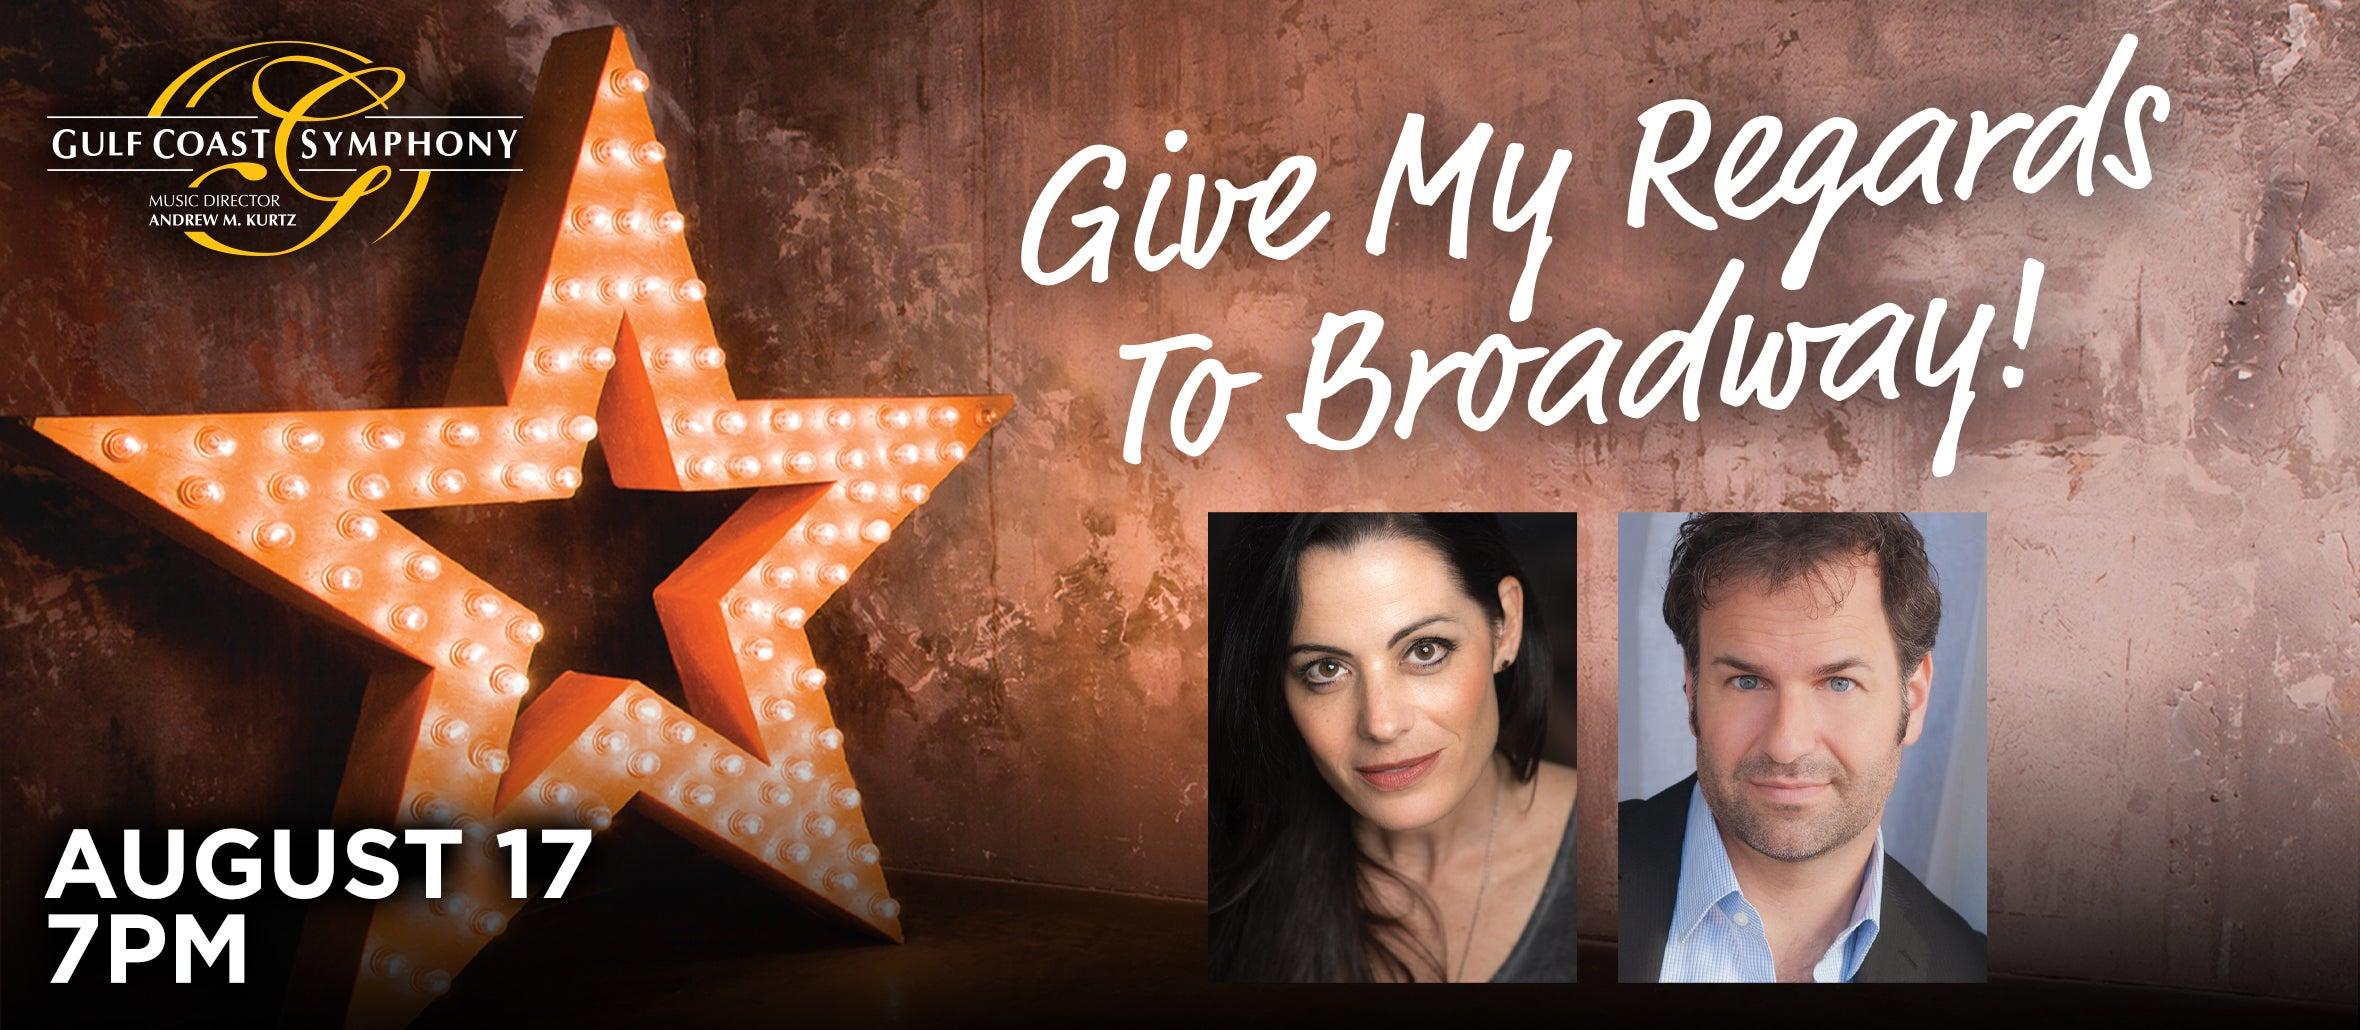 Gulf Coast Symphony: Give My Regards To Broadway